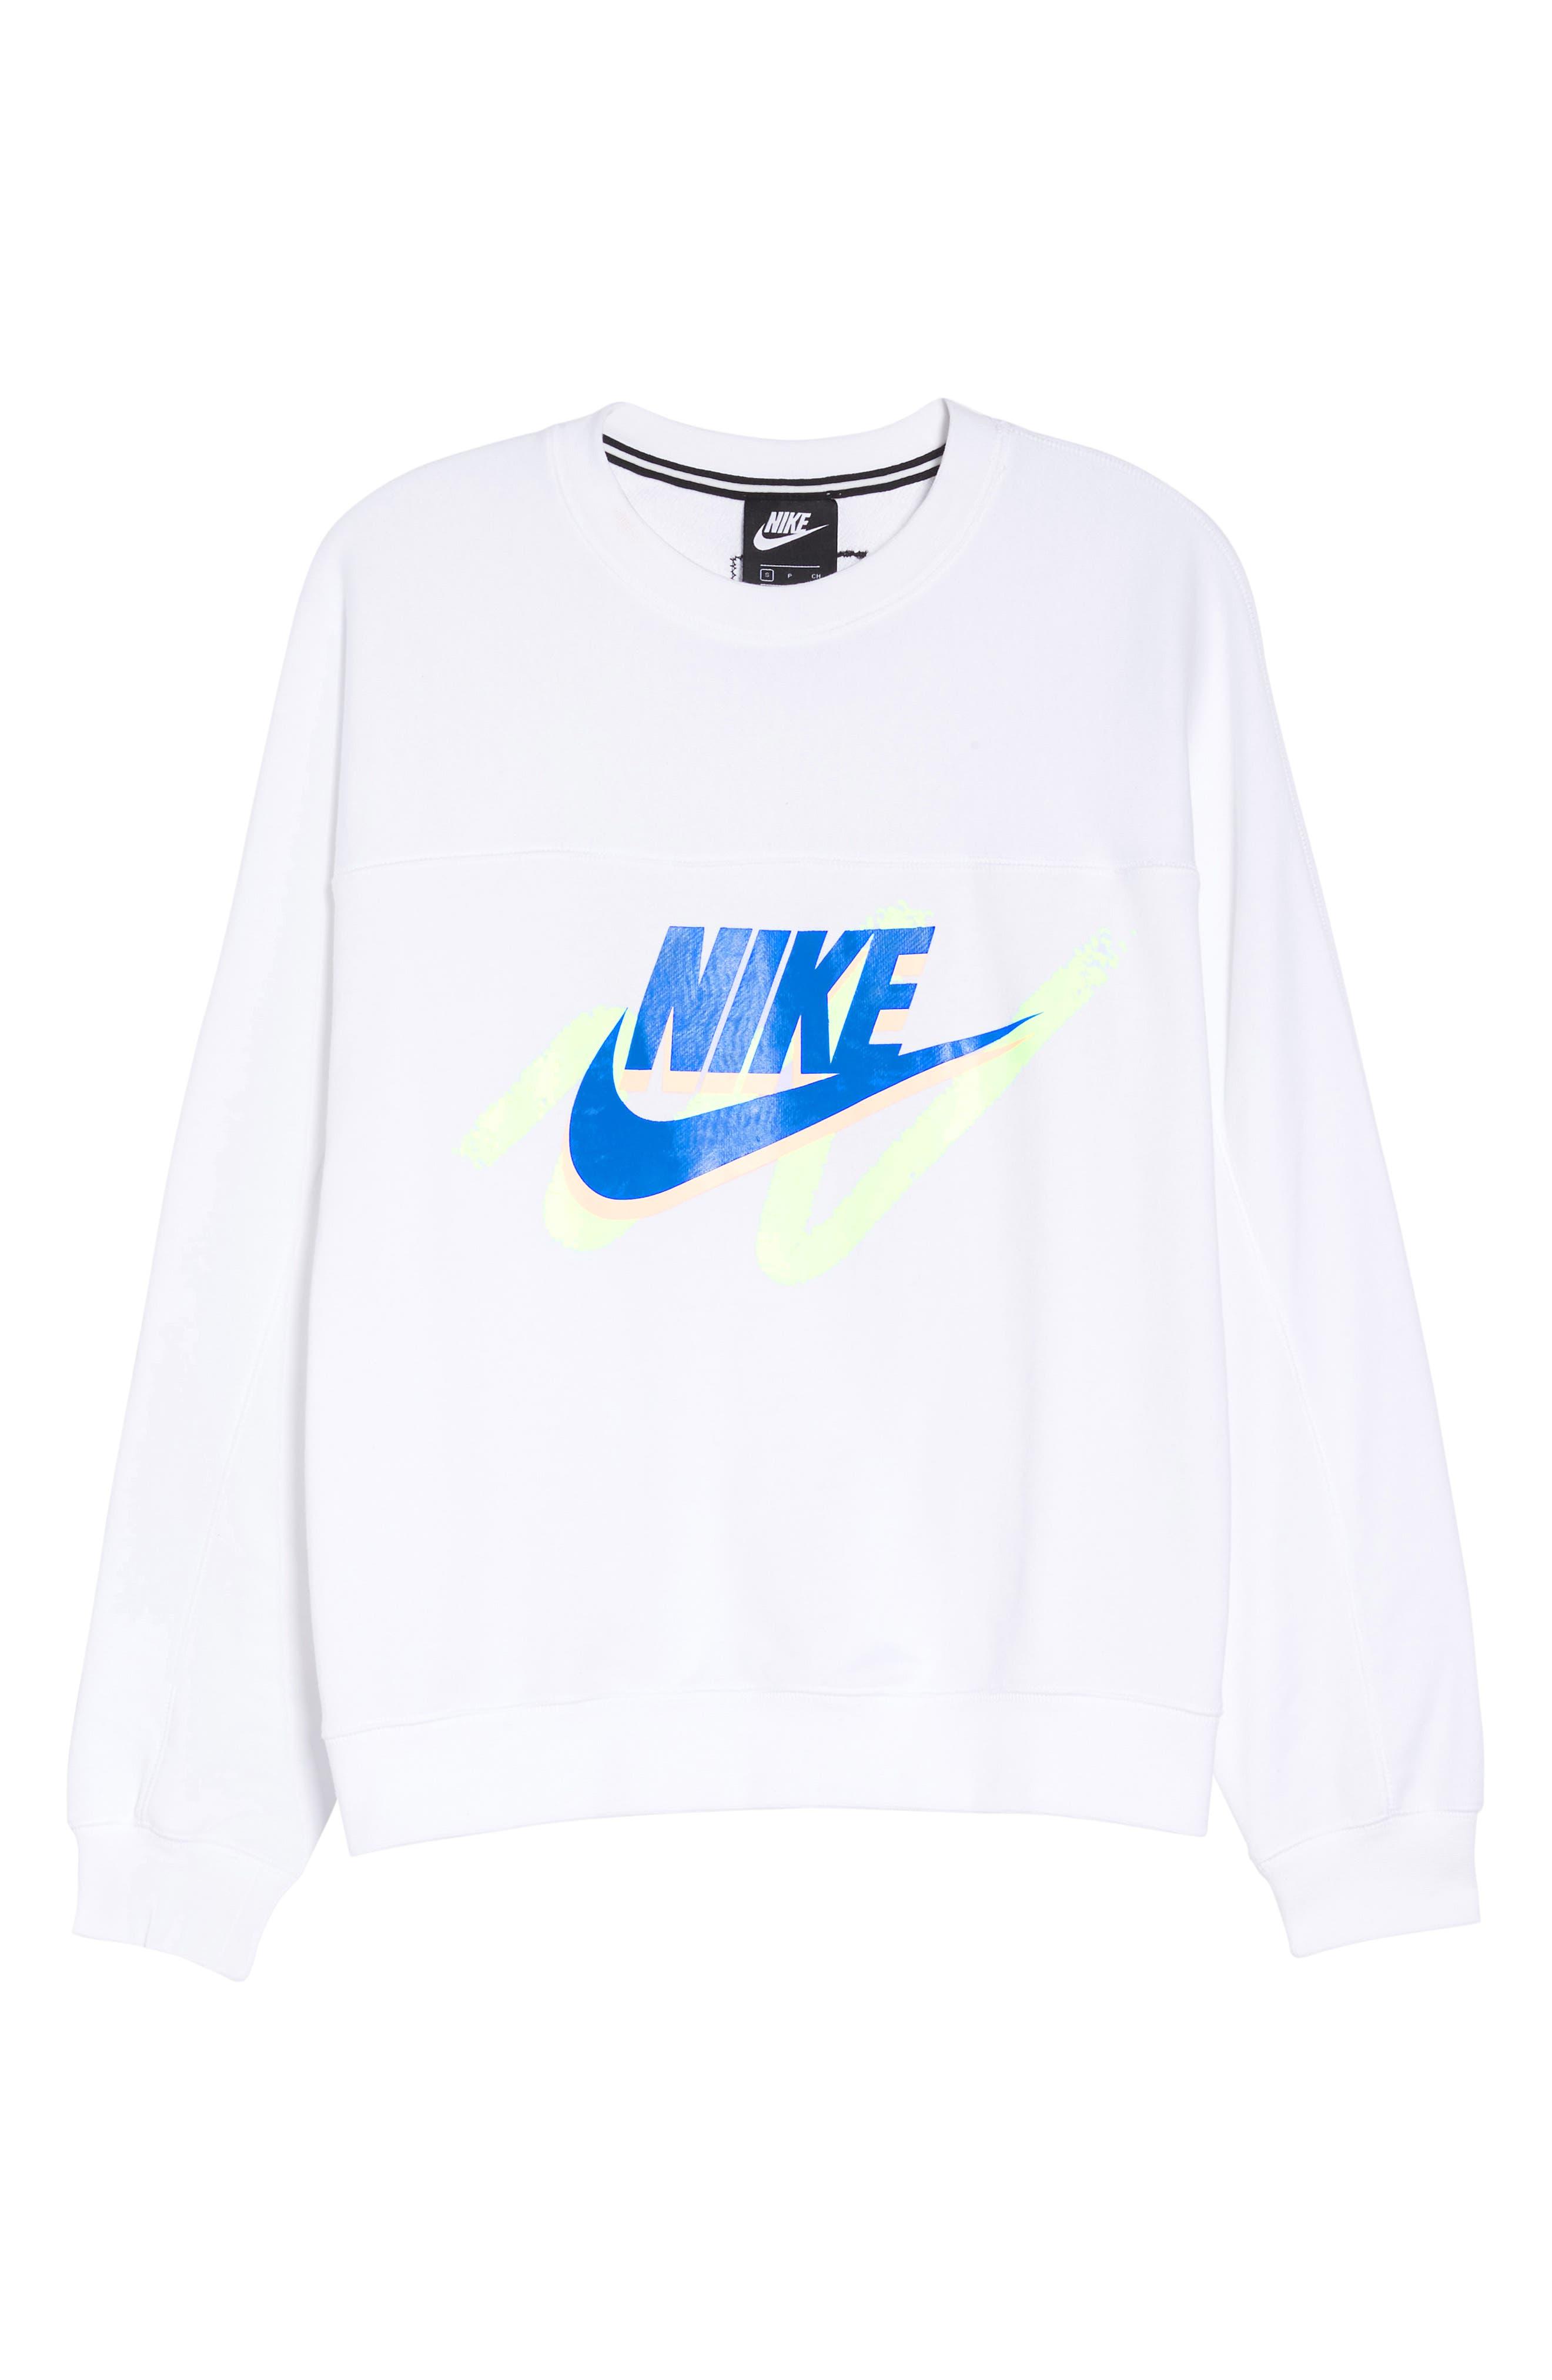 Sportswear Archive Women's Long Sleeve Crewneck Tee,                             Main thumbnail 1, color,                             WHITE/ WHITE/ WHITE